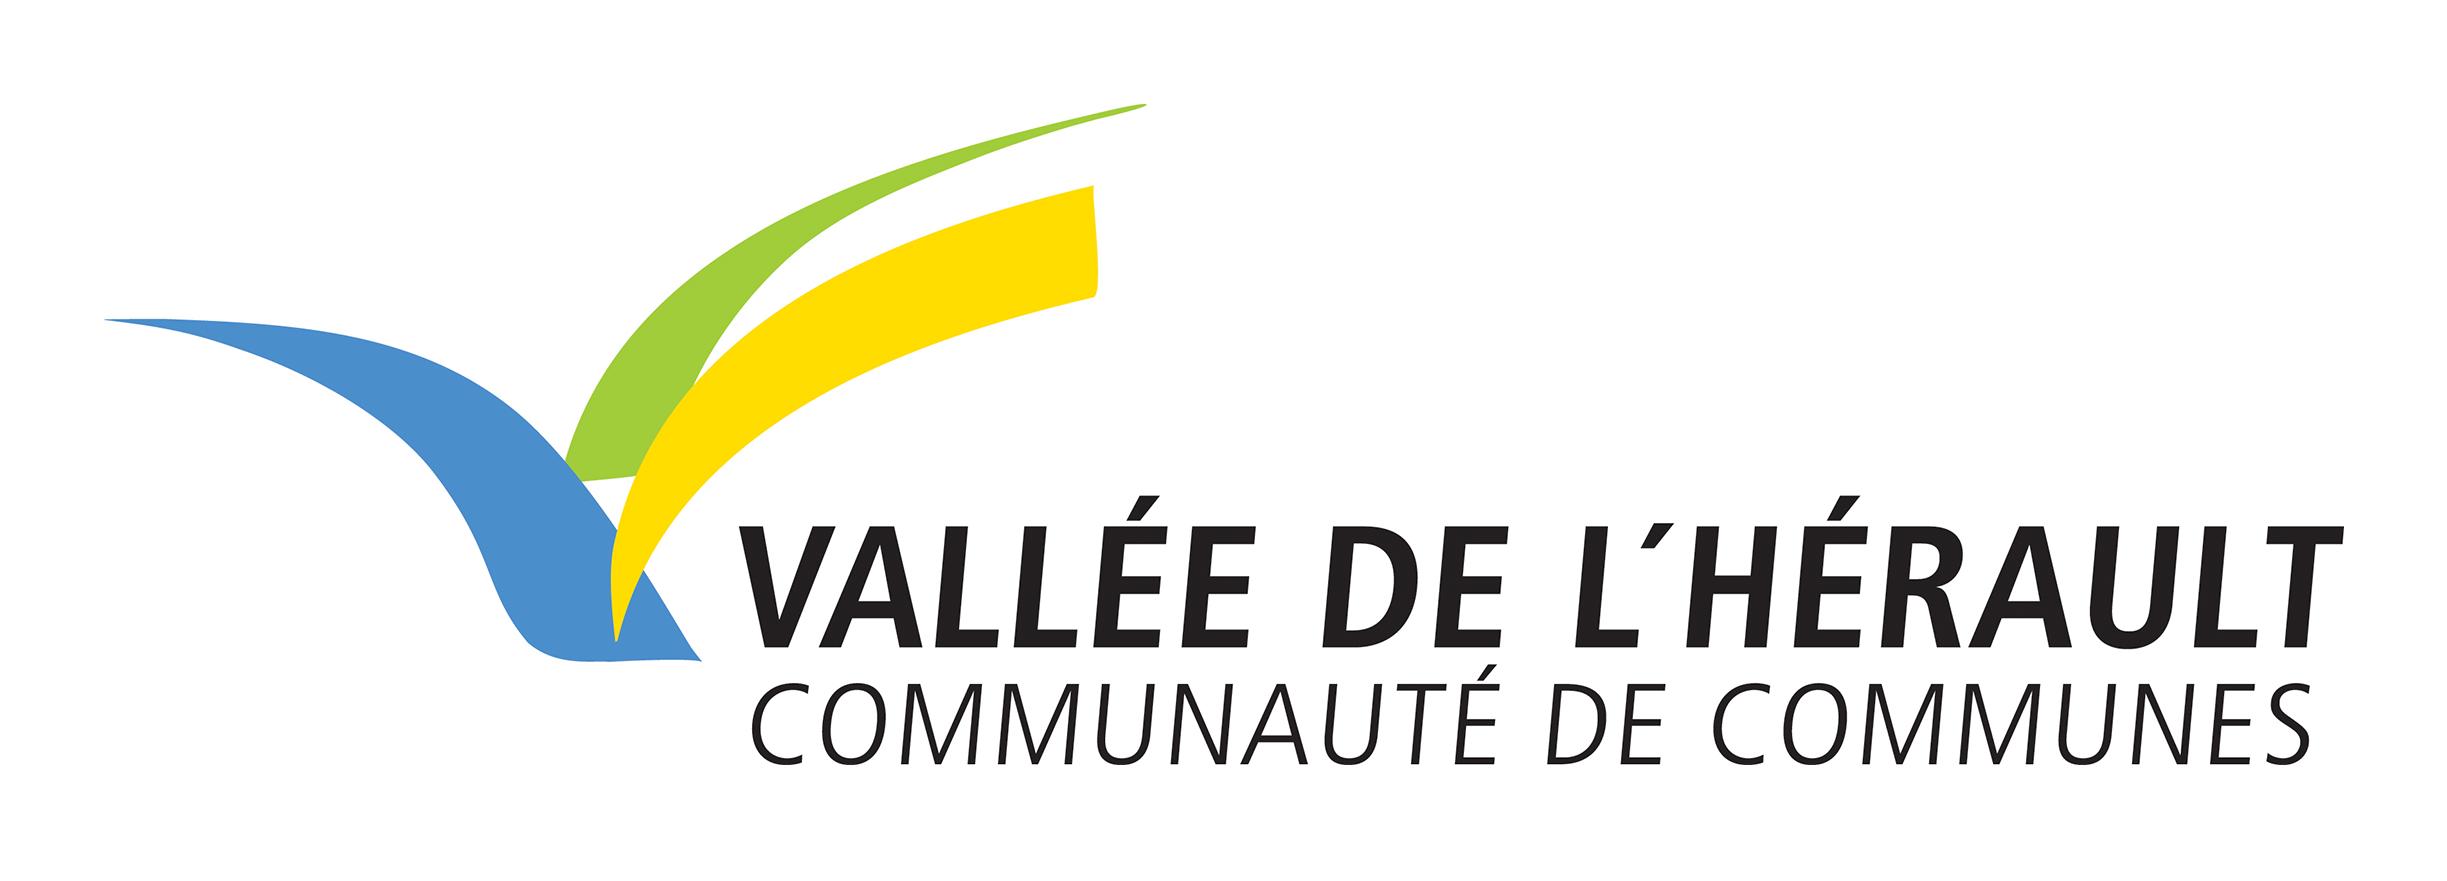 Logo Vallée de l'Hérault